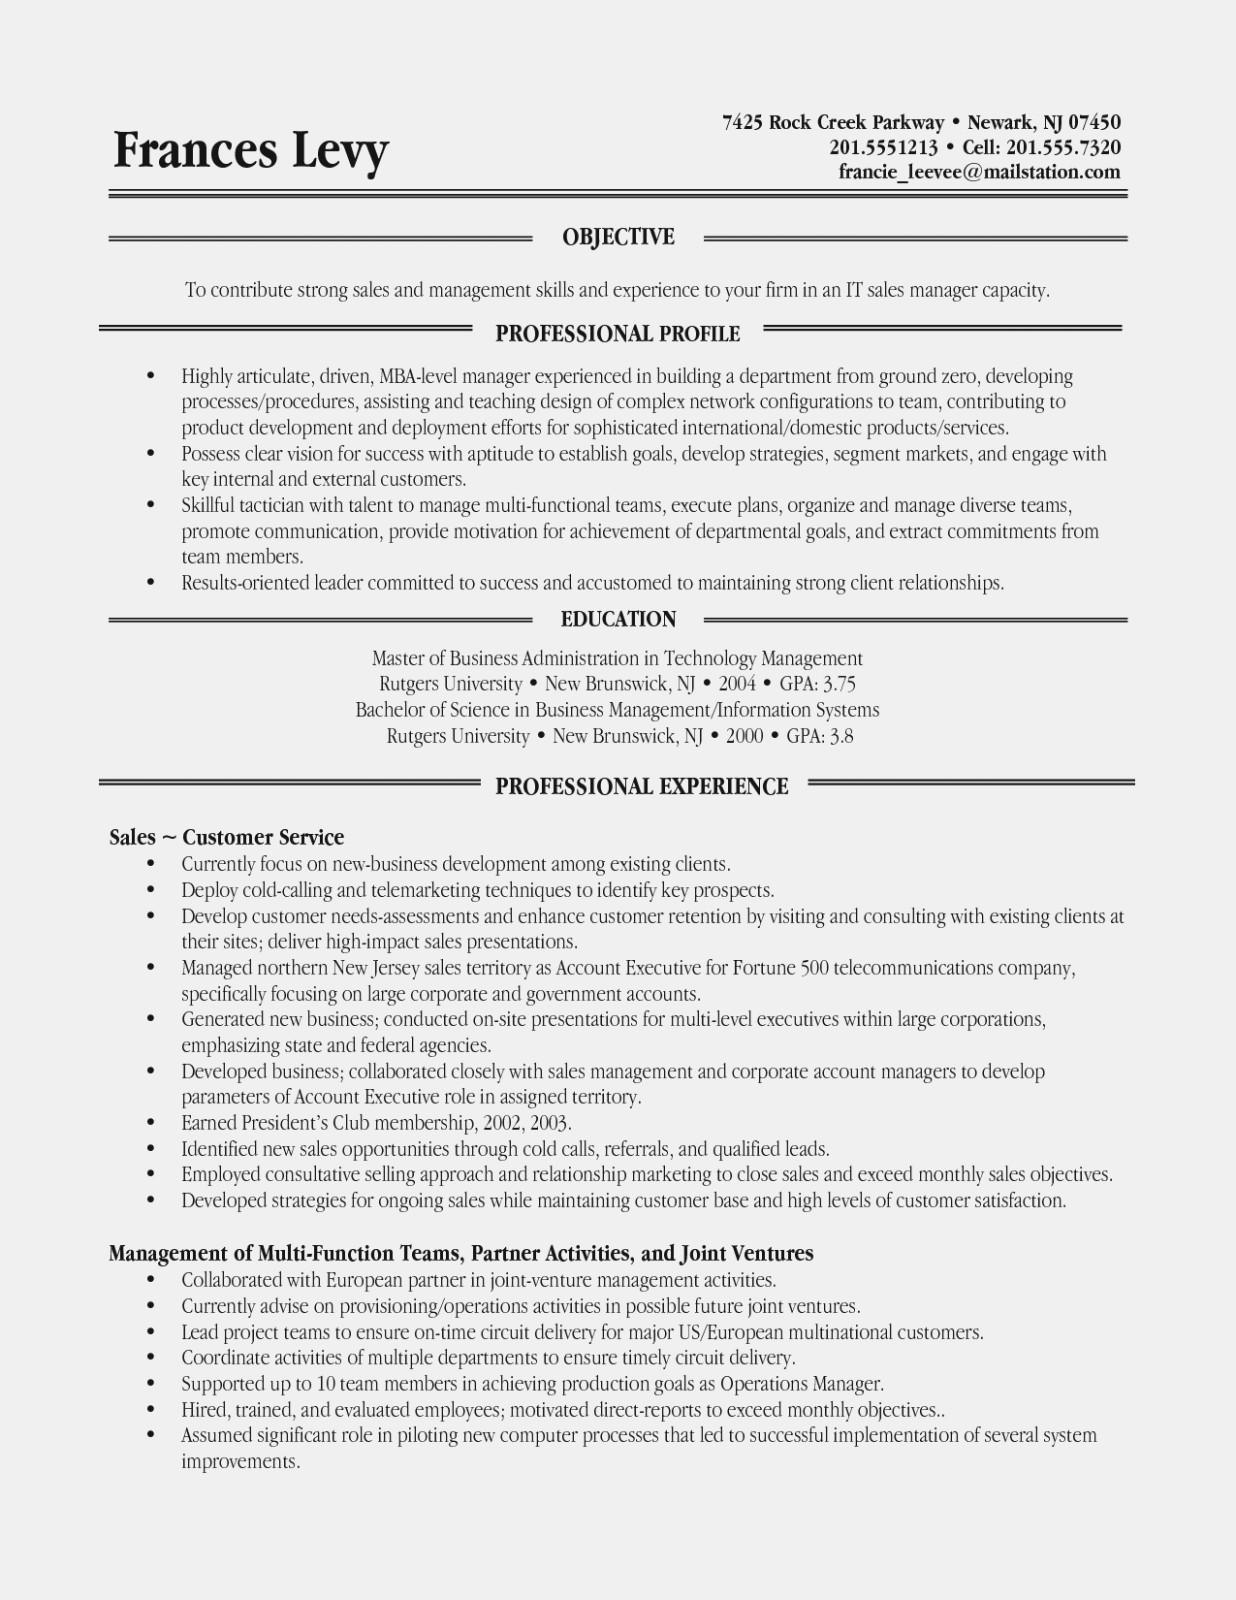 Functional Resume Examples Career Change